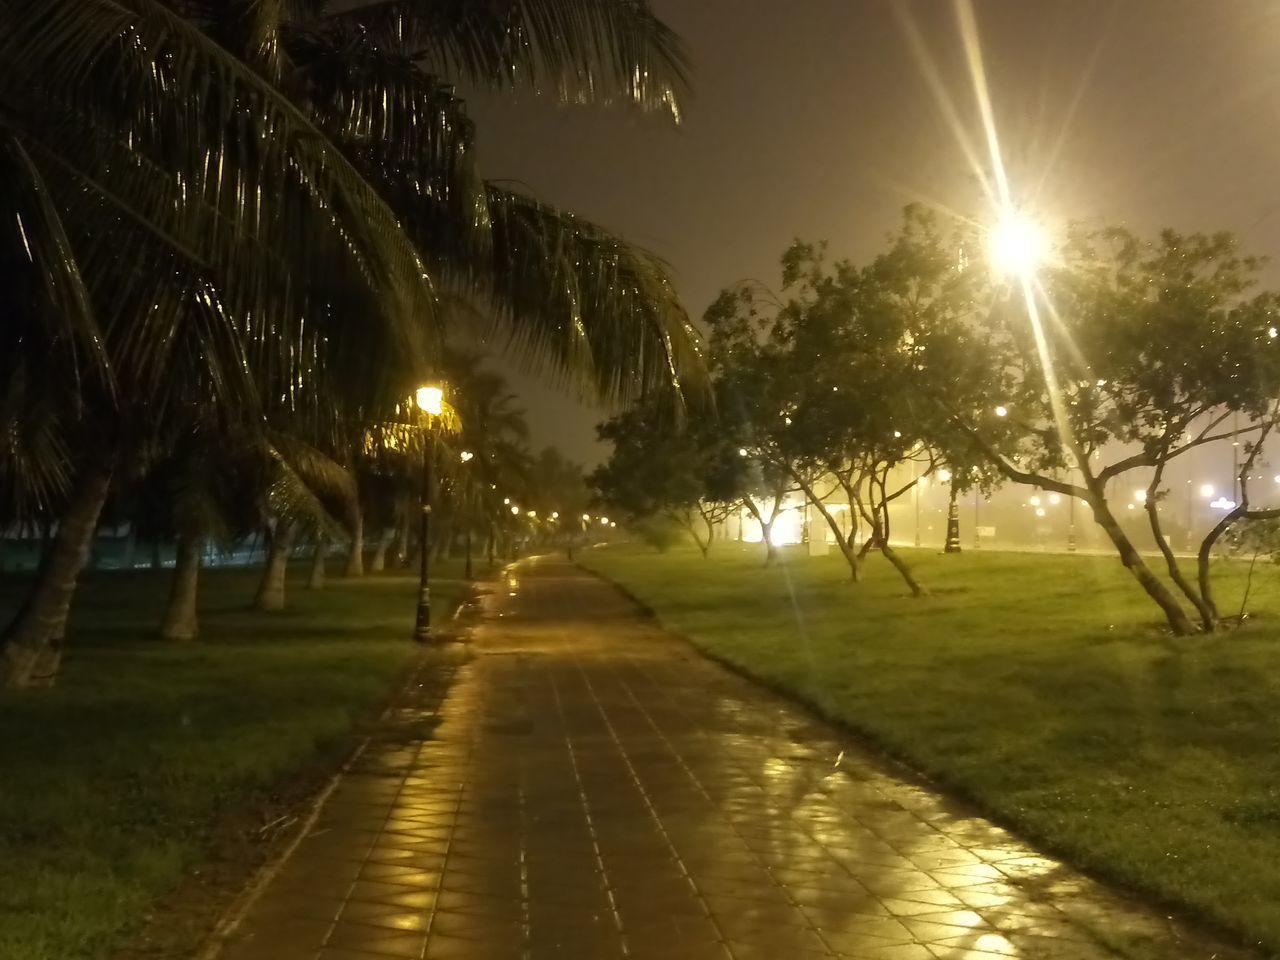 ILLUMINATED STREET LIGHT ON FOOTPATH AT NIGHT